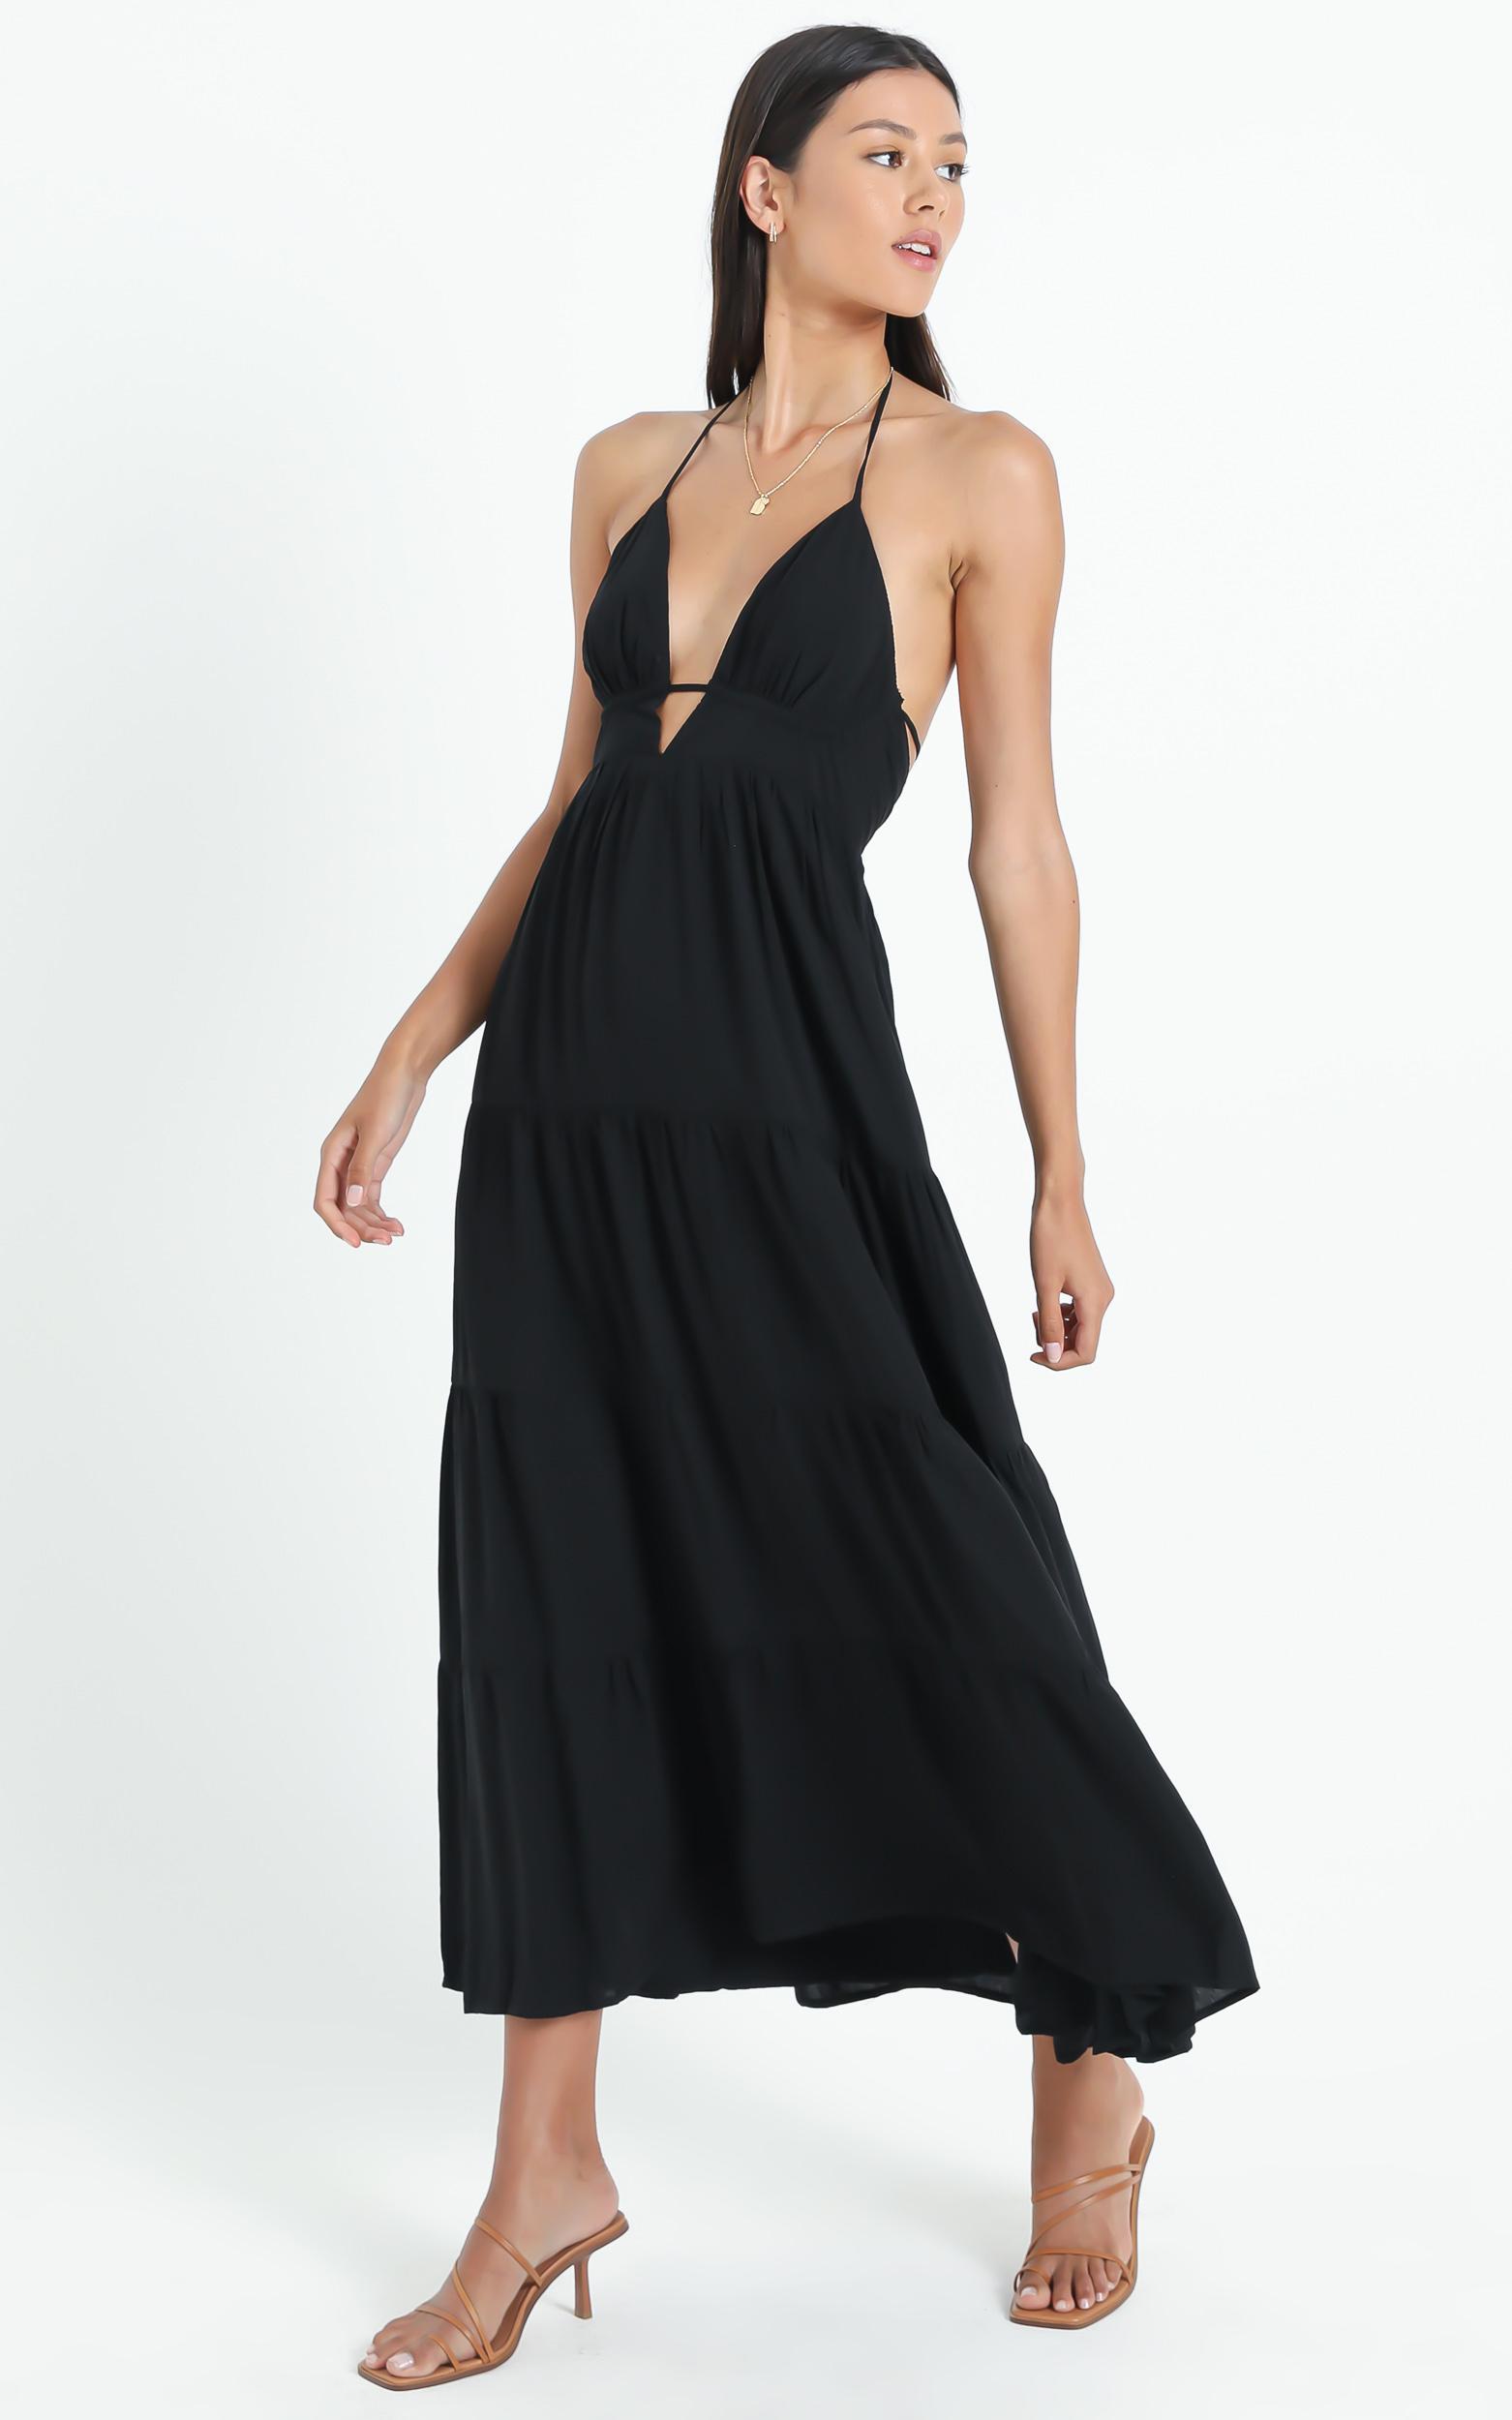 Daere Dress in Black - 6 (XS), Black, hi-res image number null